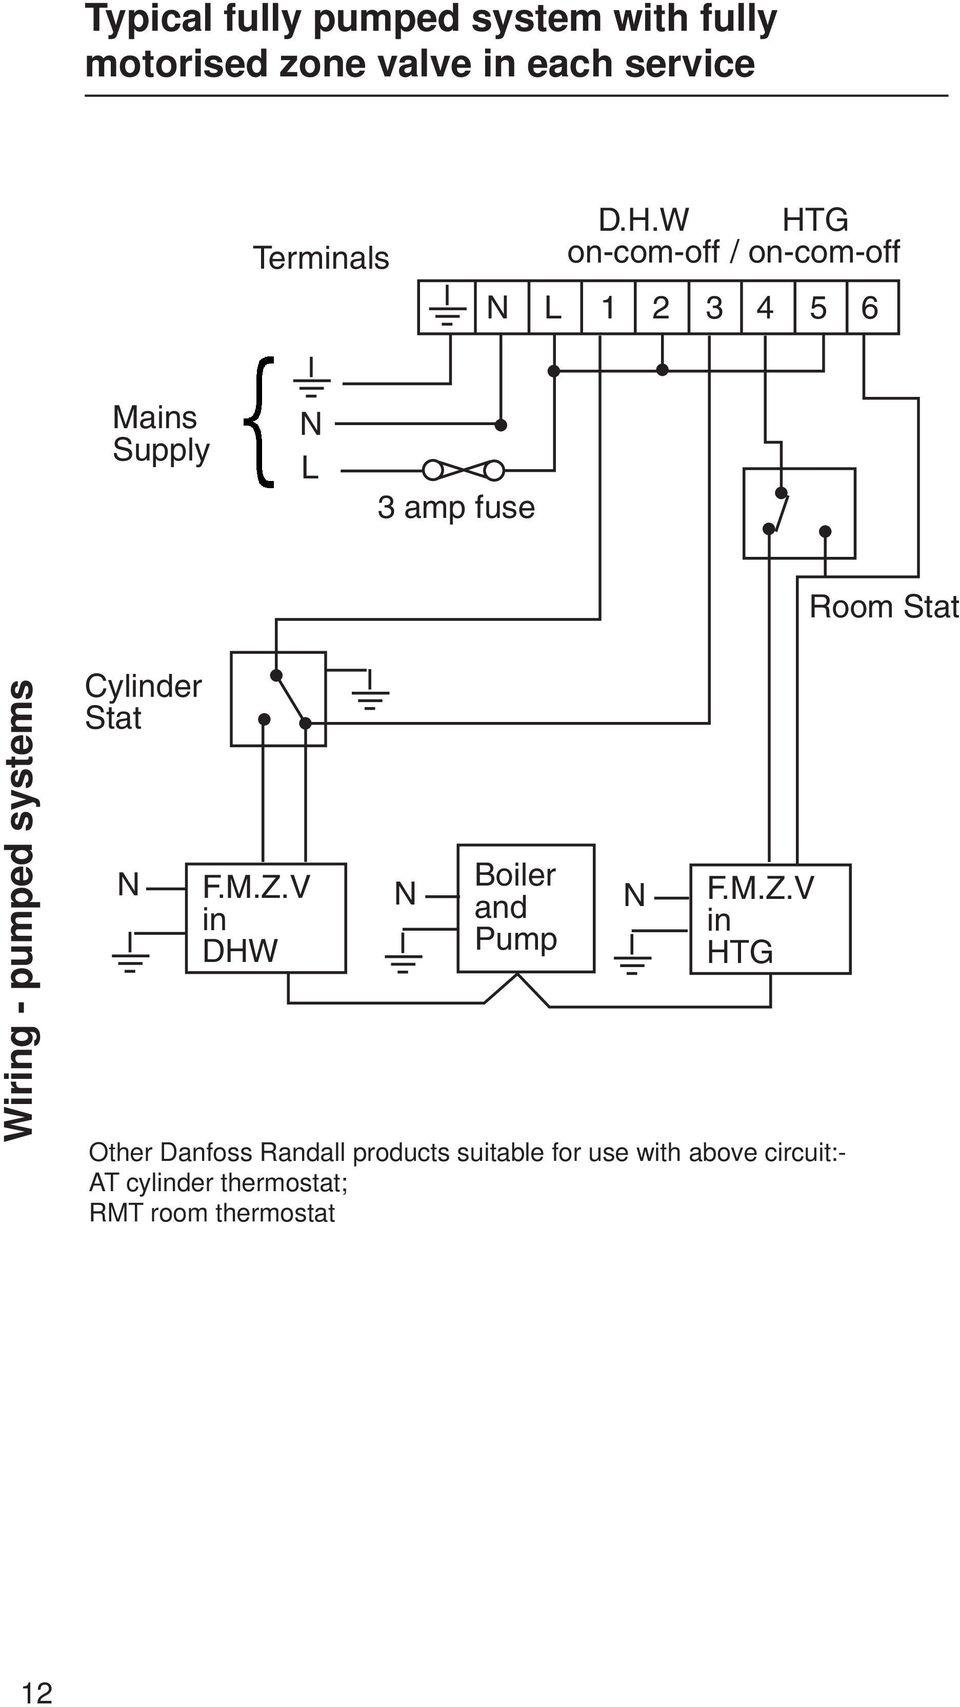 Siemens Rwb9 Wiring Diagram